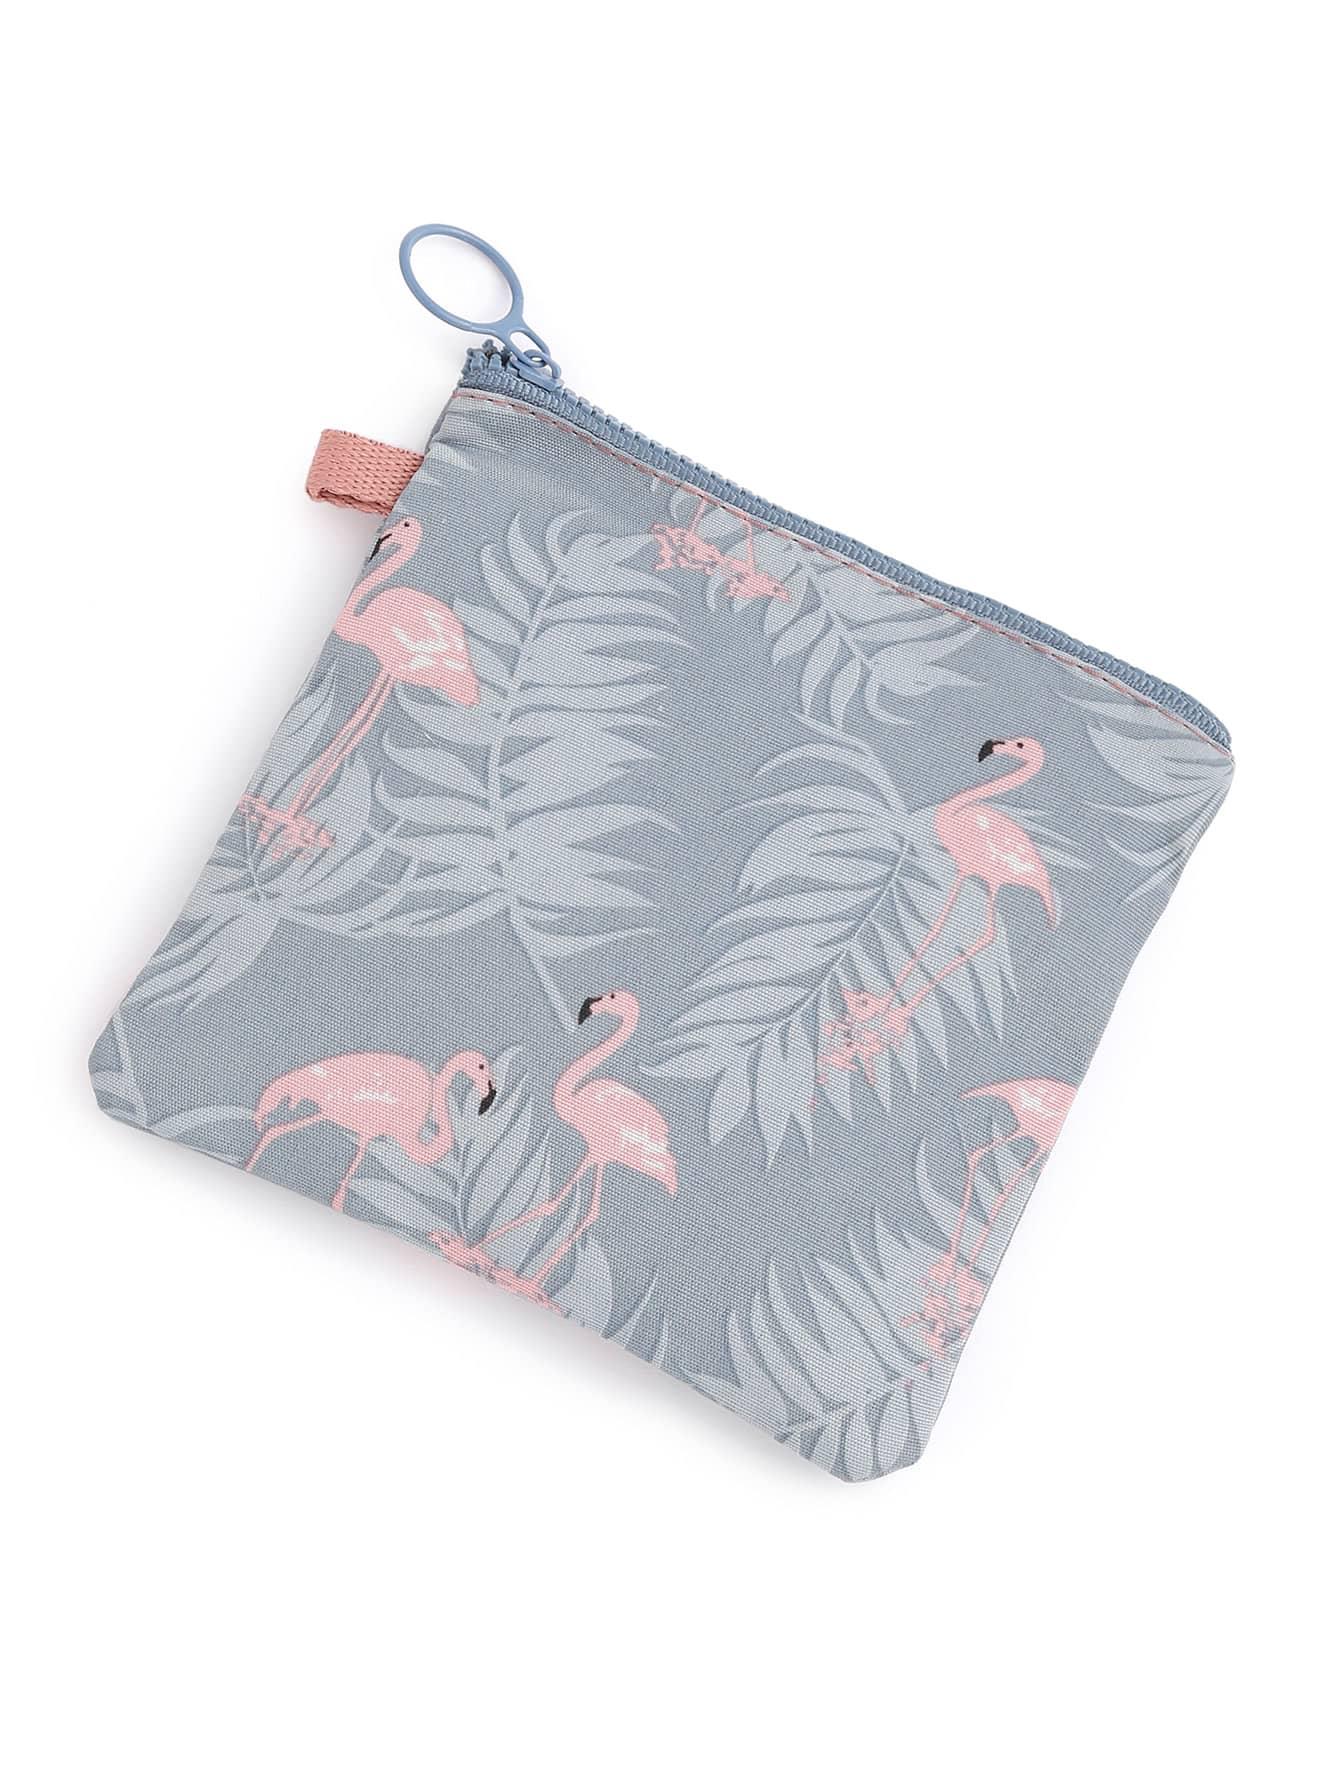 Flamingo & Jungle Print Makeup Bag